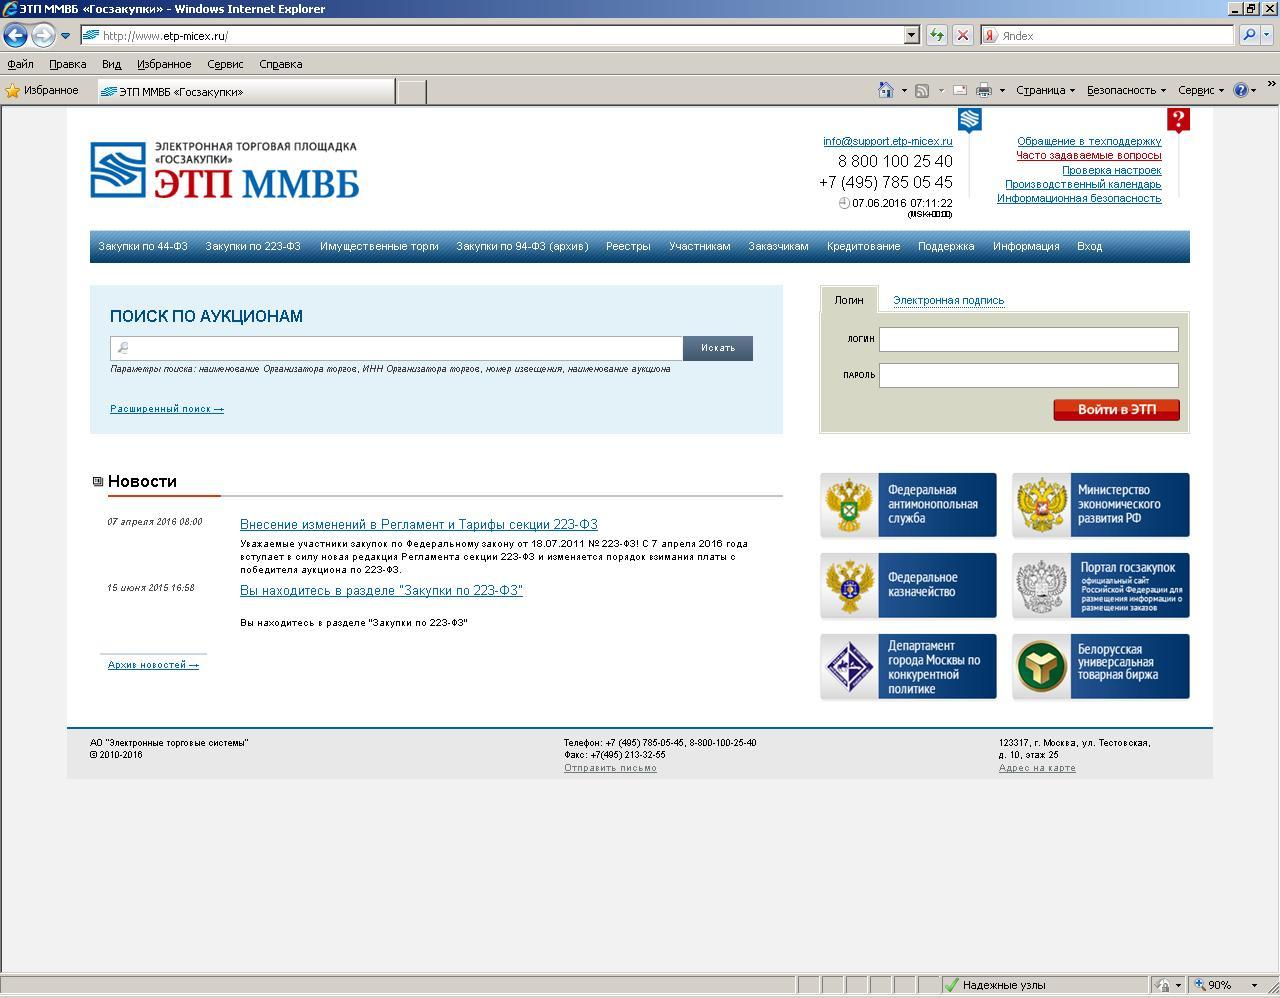 Как пройти аккредитацию на ЭТП ММВБ